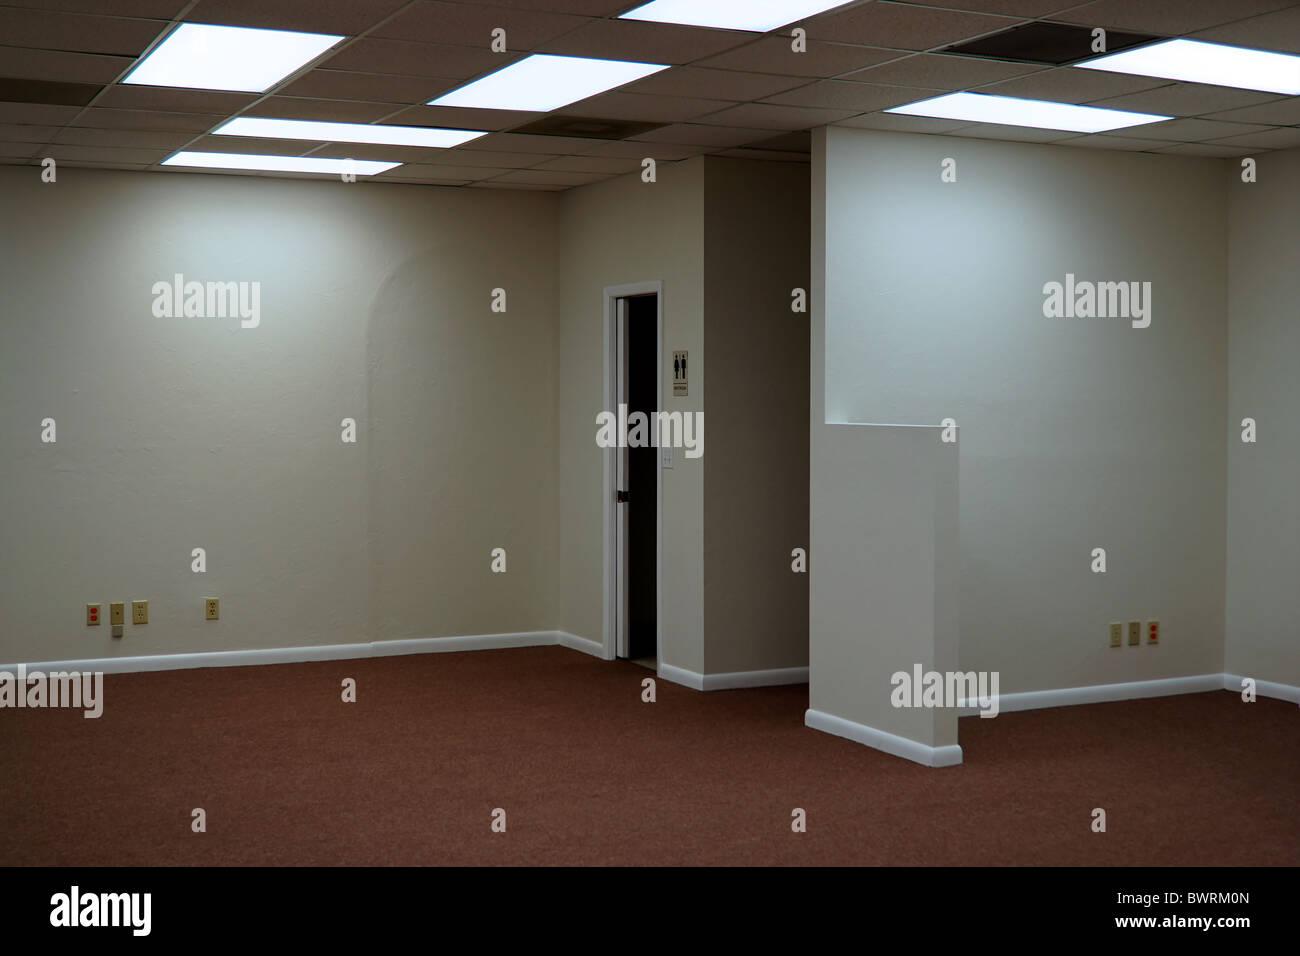 Inside empty office space lit by fluorescent ceiling light panels inside empty office space lit by fluorescent ceiling light panels showing open door to restroom aloadofball Gallery